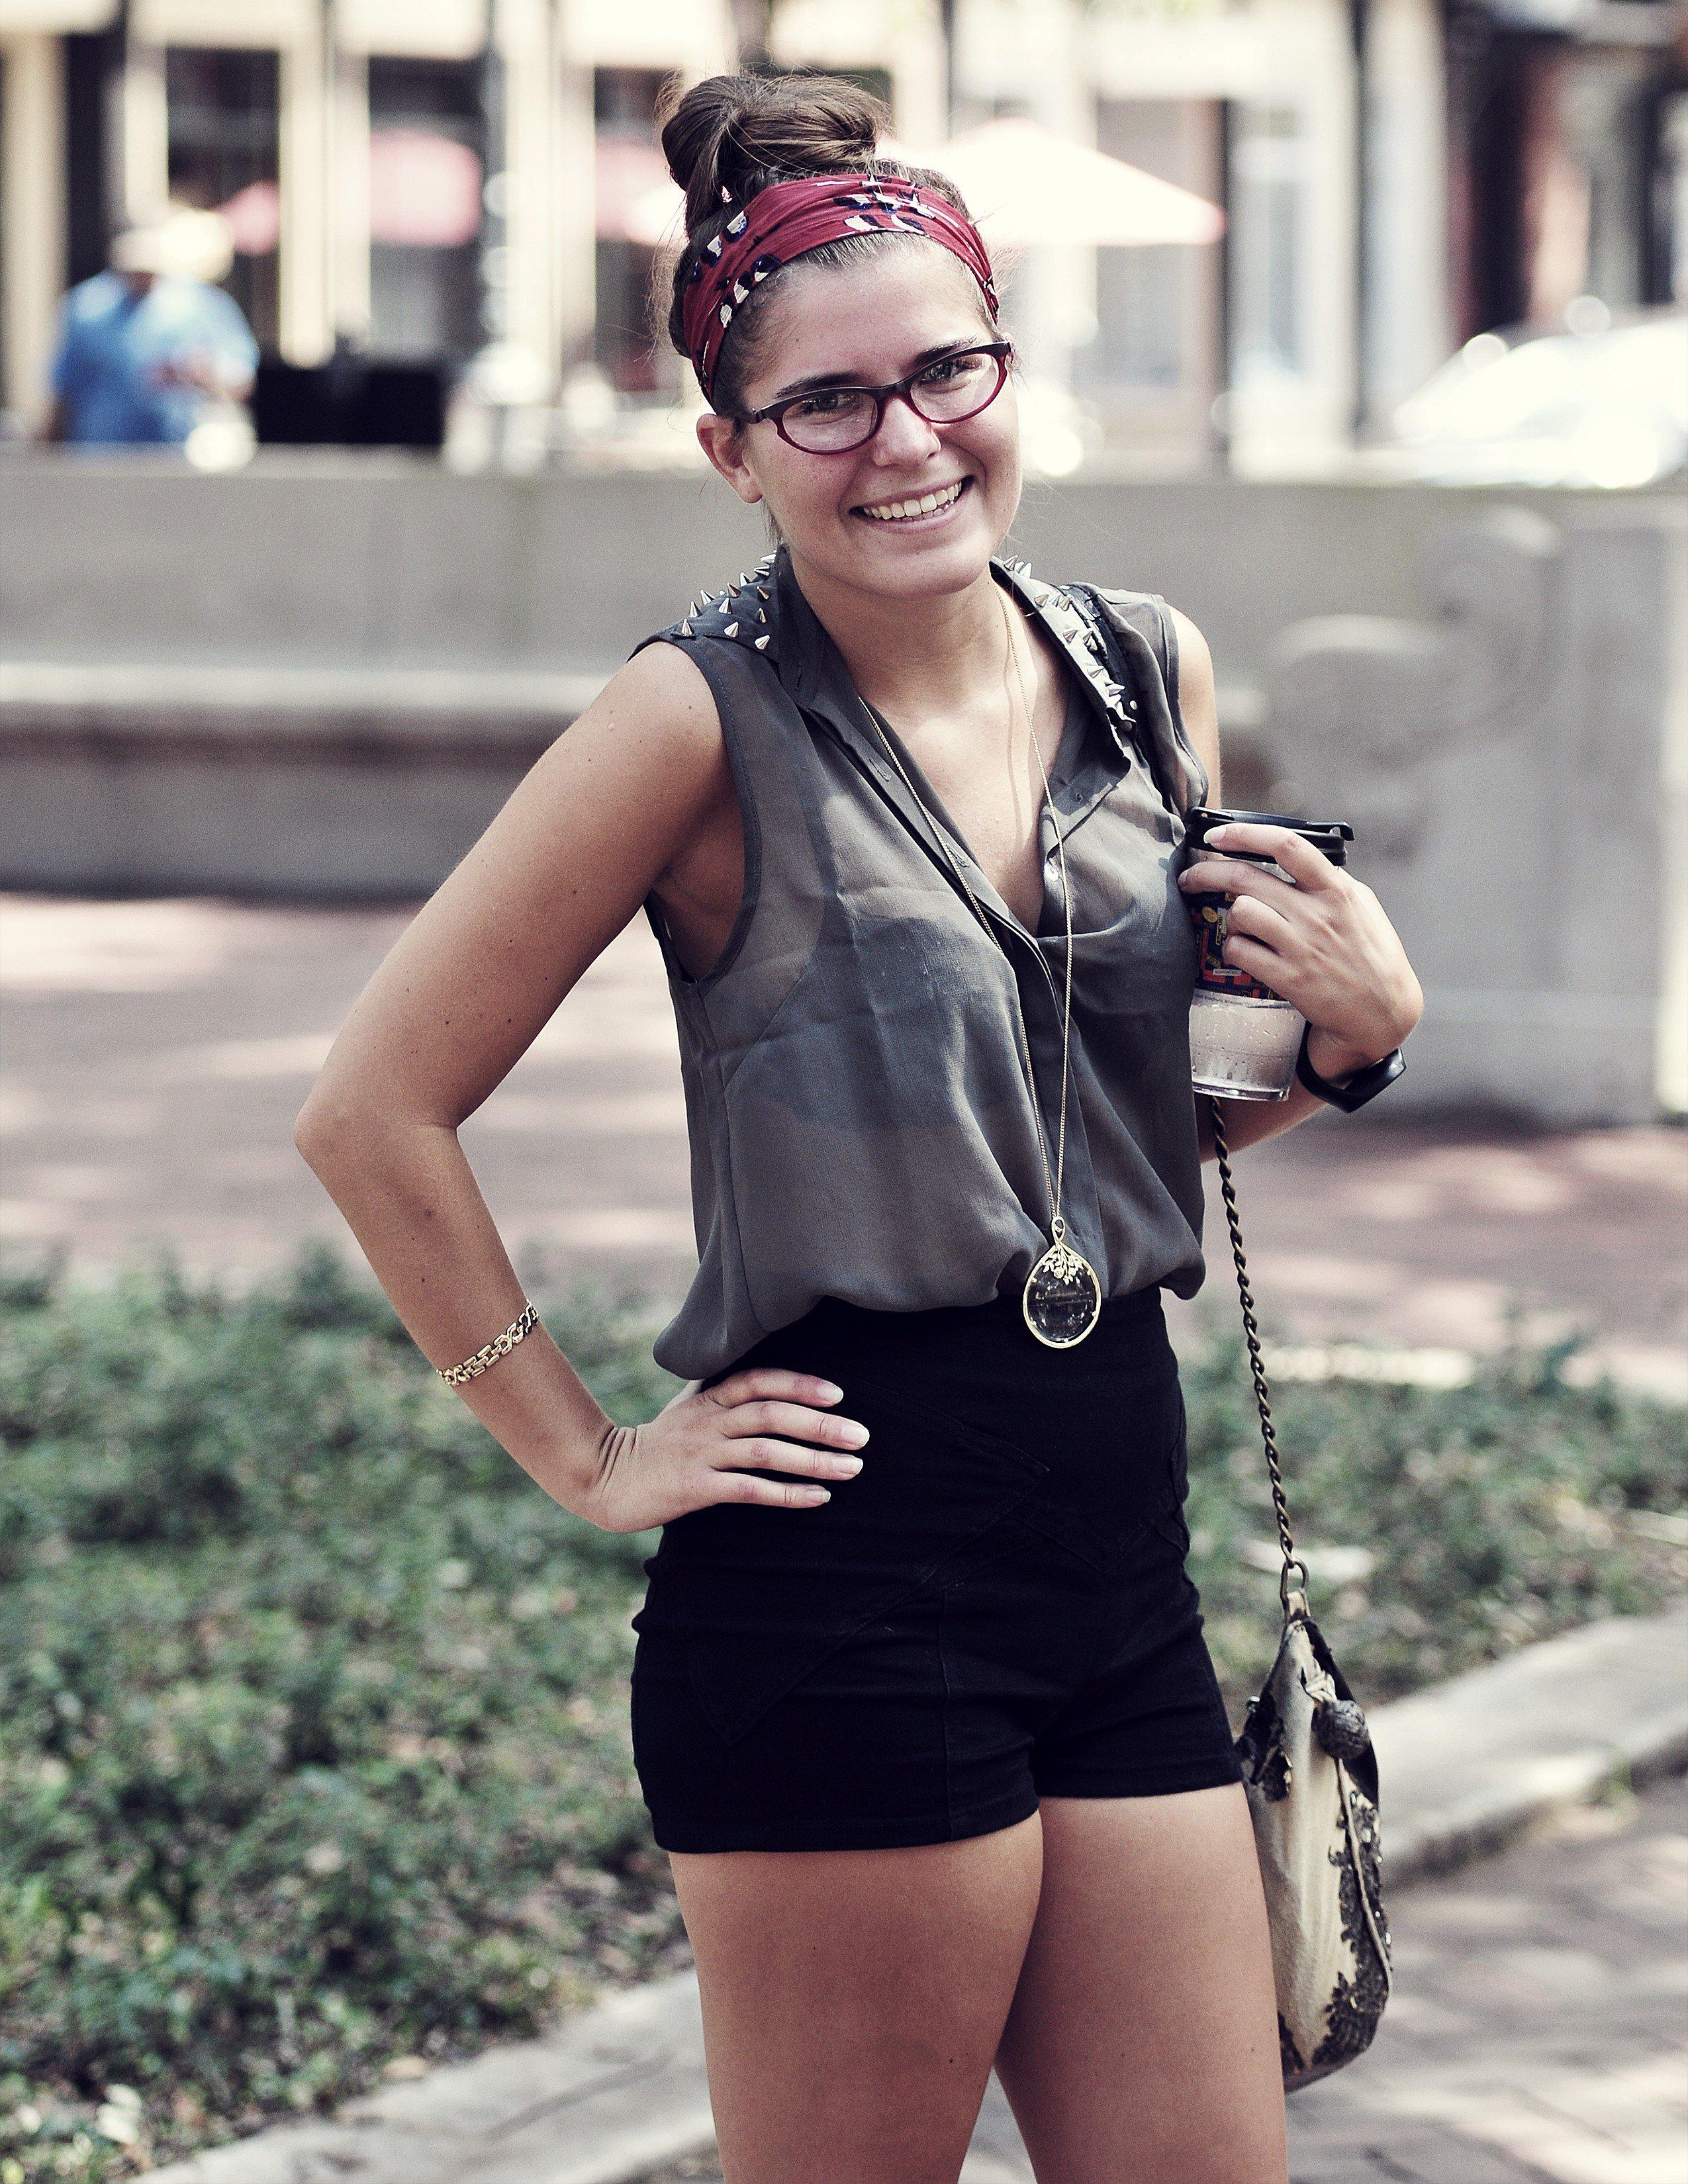 college-fashioncedric_smith_2012_scad_008.jpg